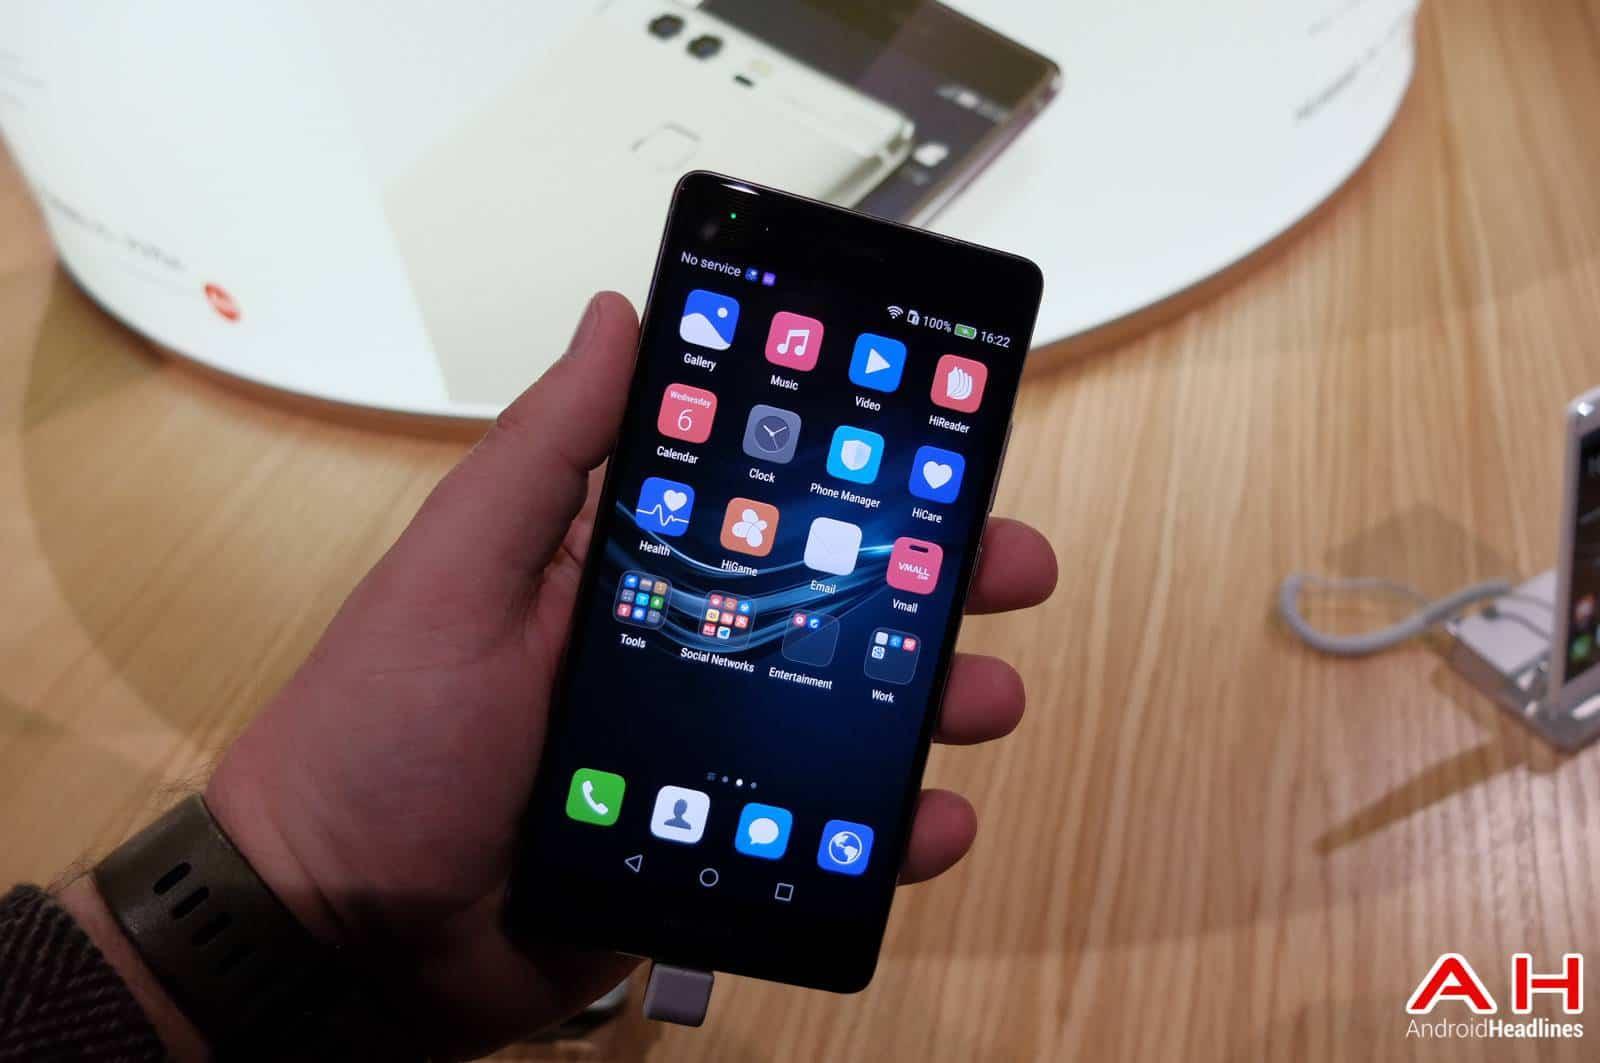 Huawei P9 Plus AH 0500